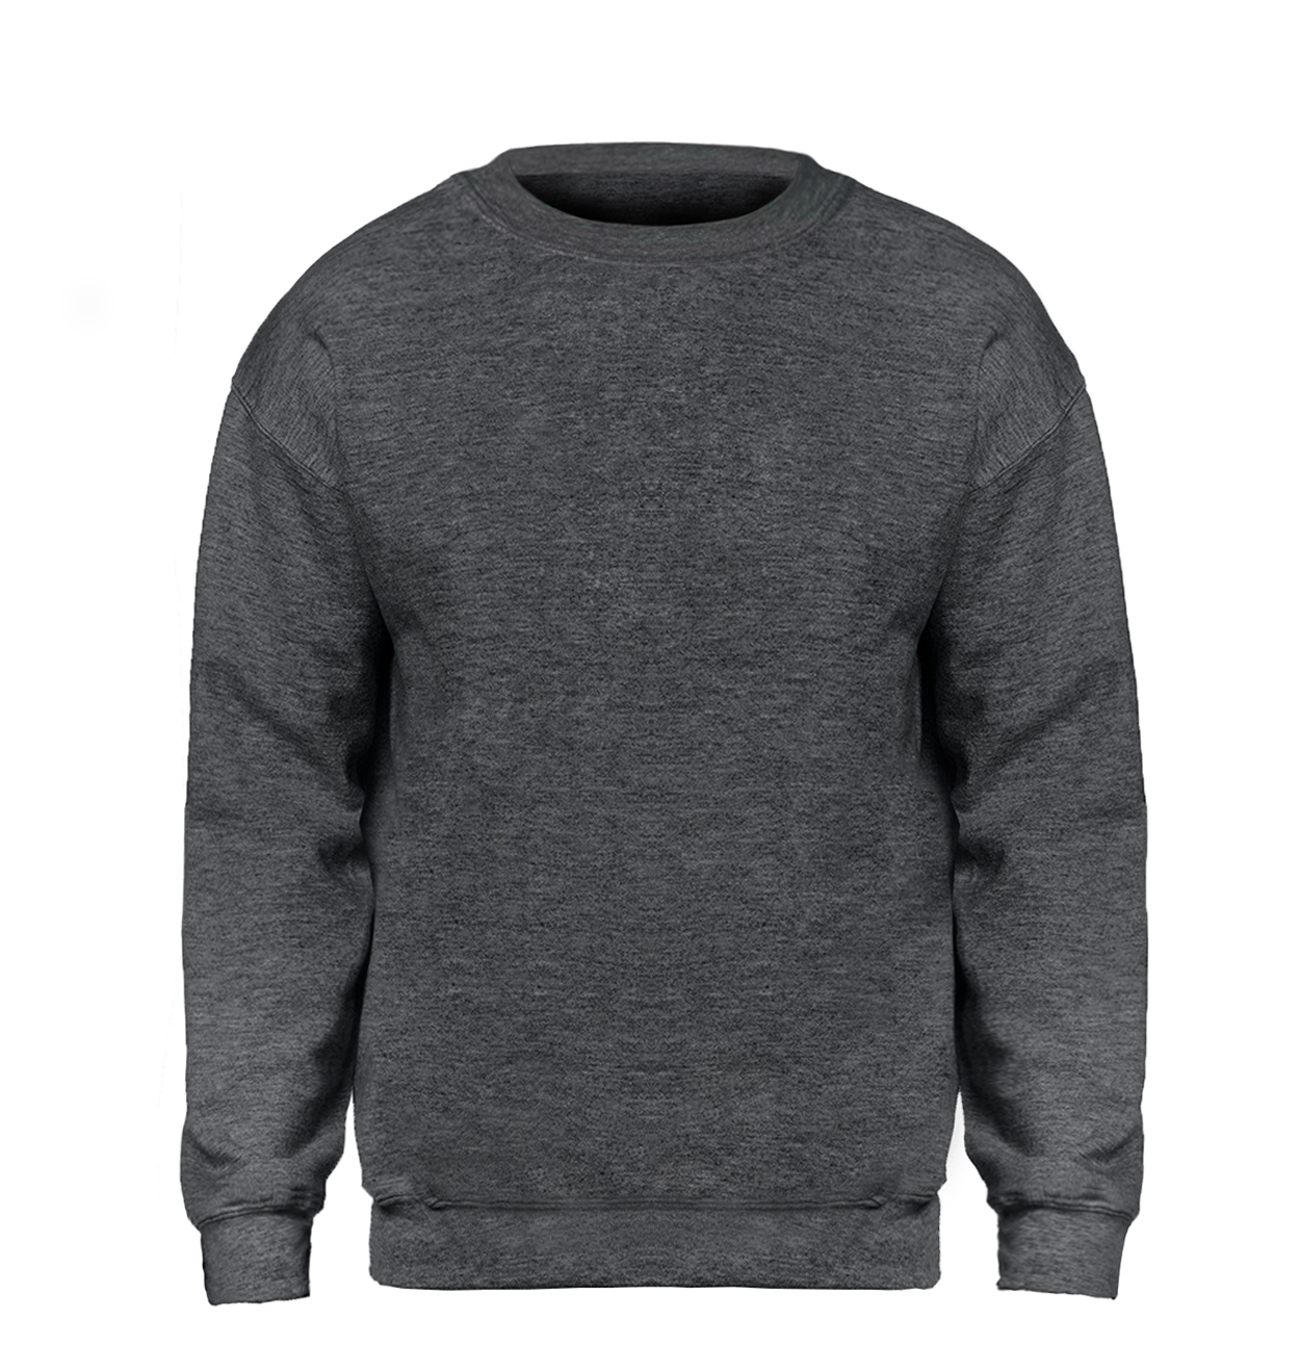 Solid color Sweatshirt Men Hoodie Crewneck Sweatshirts Winter Autumn Fleece Hoody Casual Gray Blue Red Black White Streetwear 4